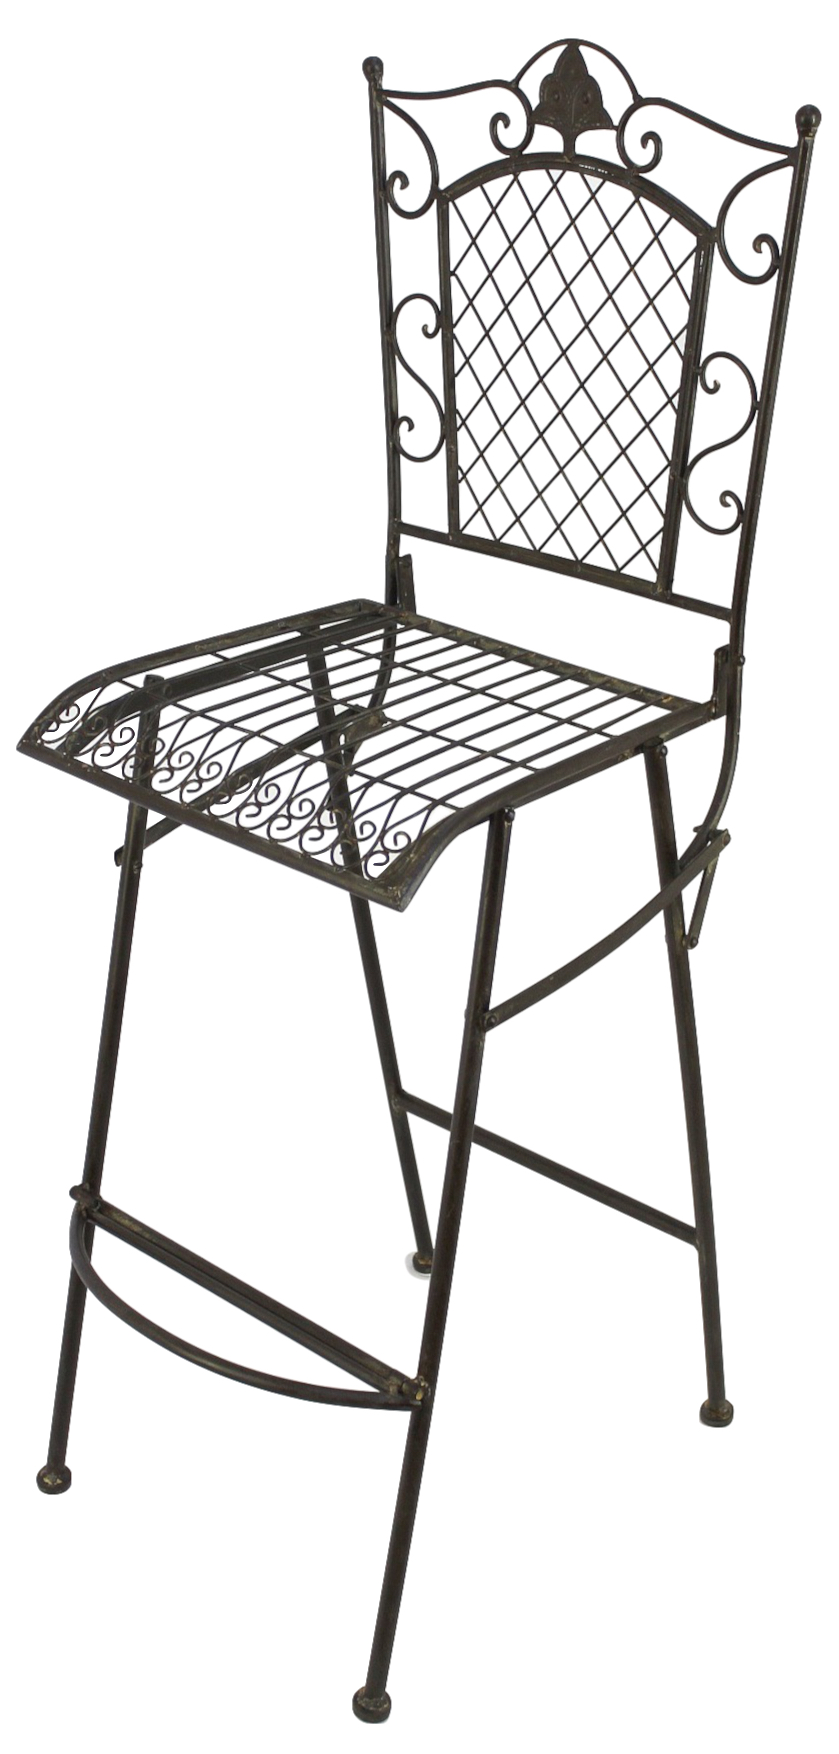 Tabouret De Bar Chaise Pliante 20833 Ancien Metal Jardin Haute